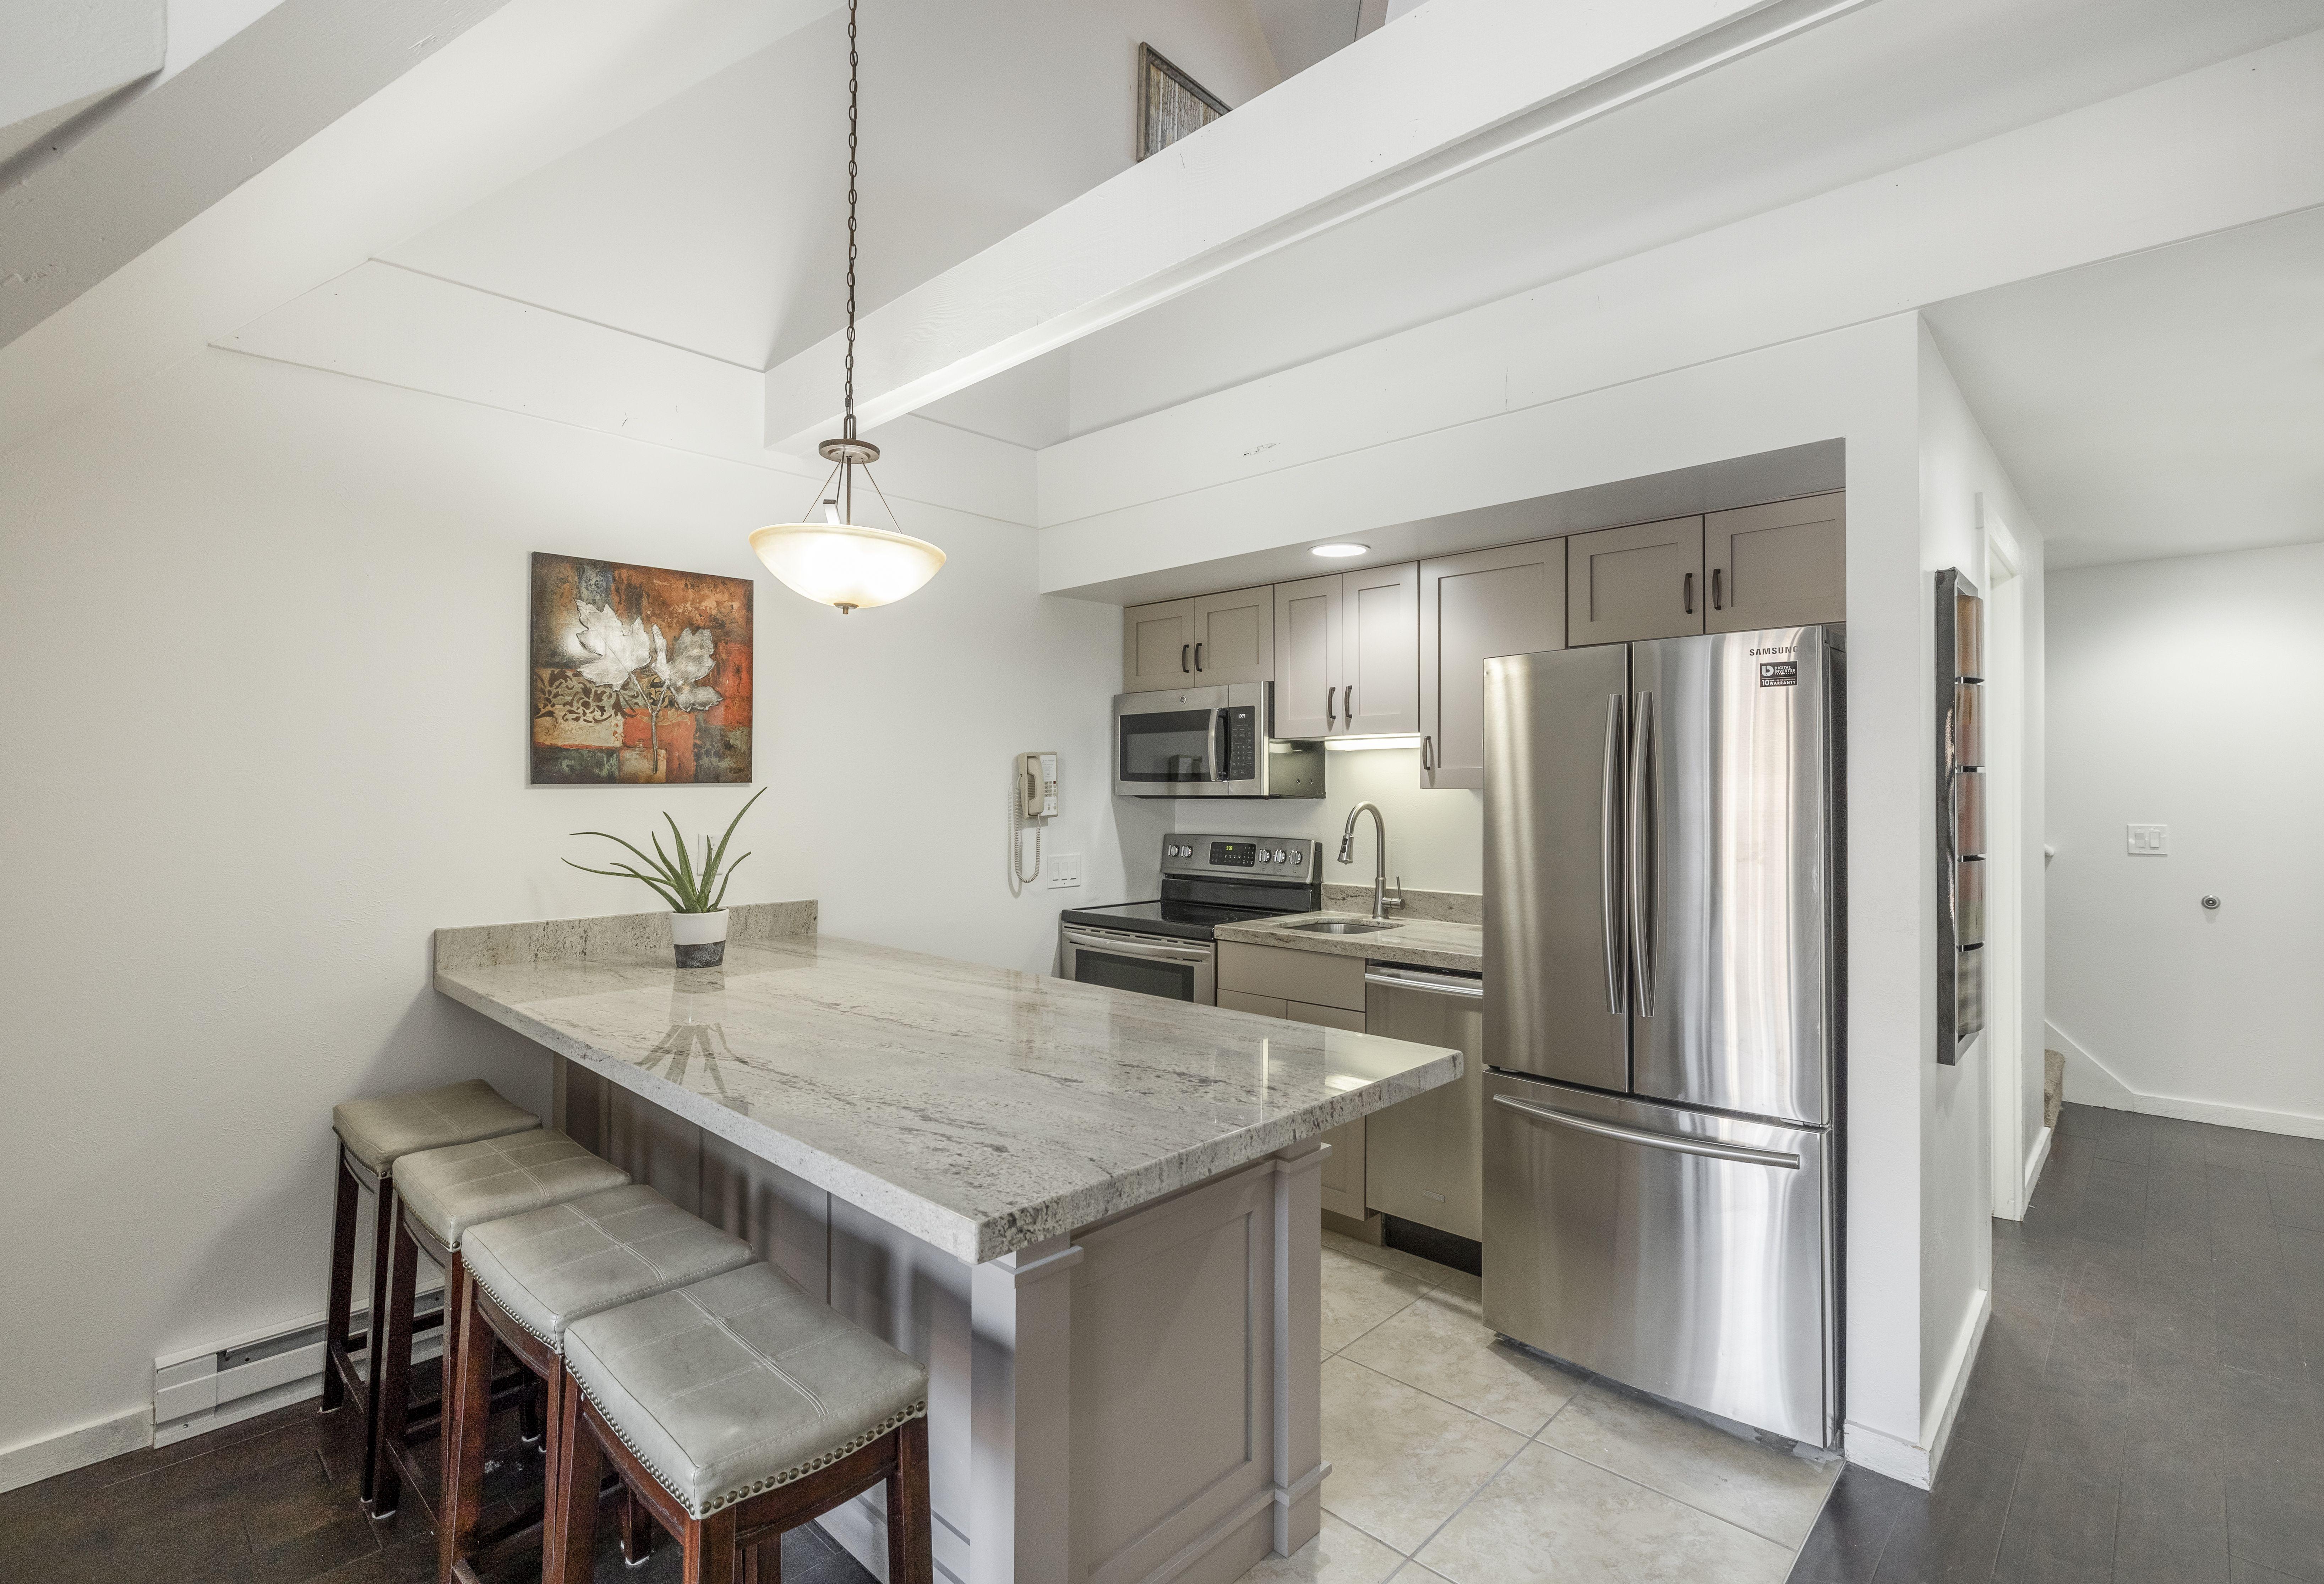 1385 Lowell Ave 303 Park City, UT 84060 #WindermereUtah #RealEstate #ParkCity #Utah #CondoLife #Kitchen #KitchenIsland #BarStools #KitchenArea #KitchenDesign #HomeDesign #HomeDecor #Condo #UtahLiving #ParkCityLife #ParkCityCondo #SkiInSkiOut